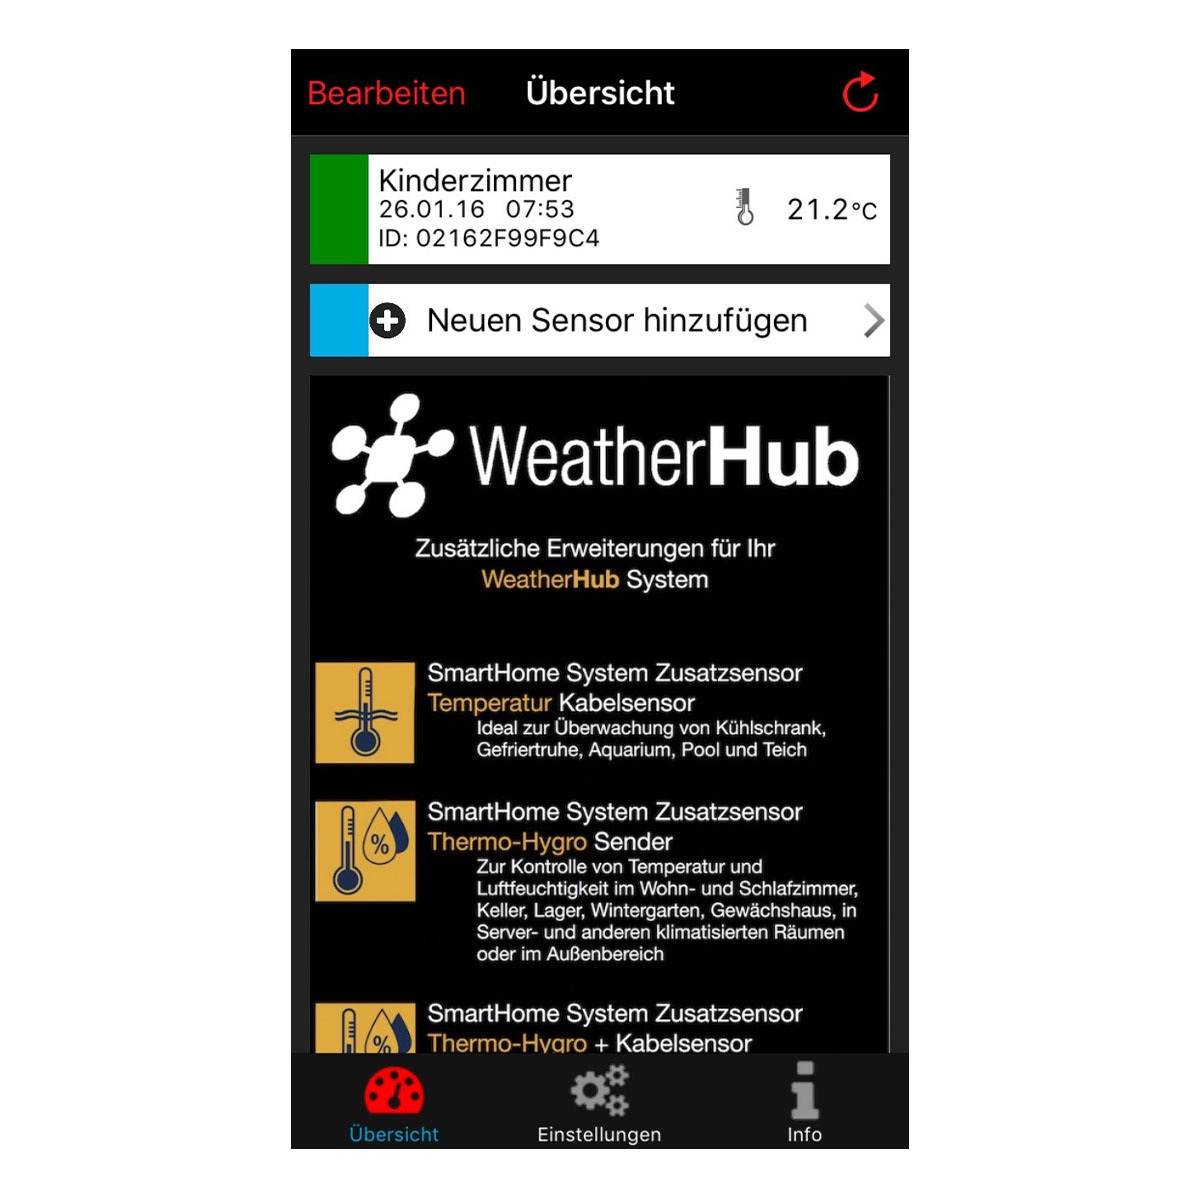 31-4001-02-starter-set-mit-temperatursender-weatherhub-app-anwendung-1200x1200px.jpg